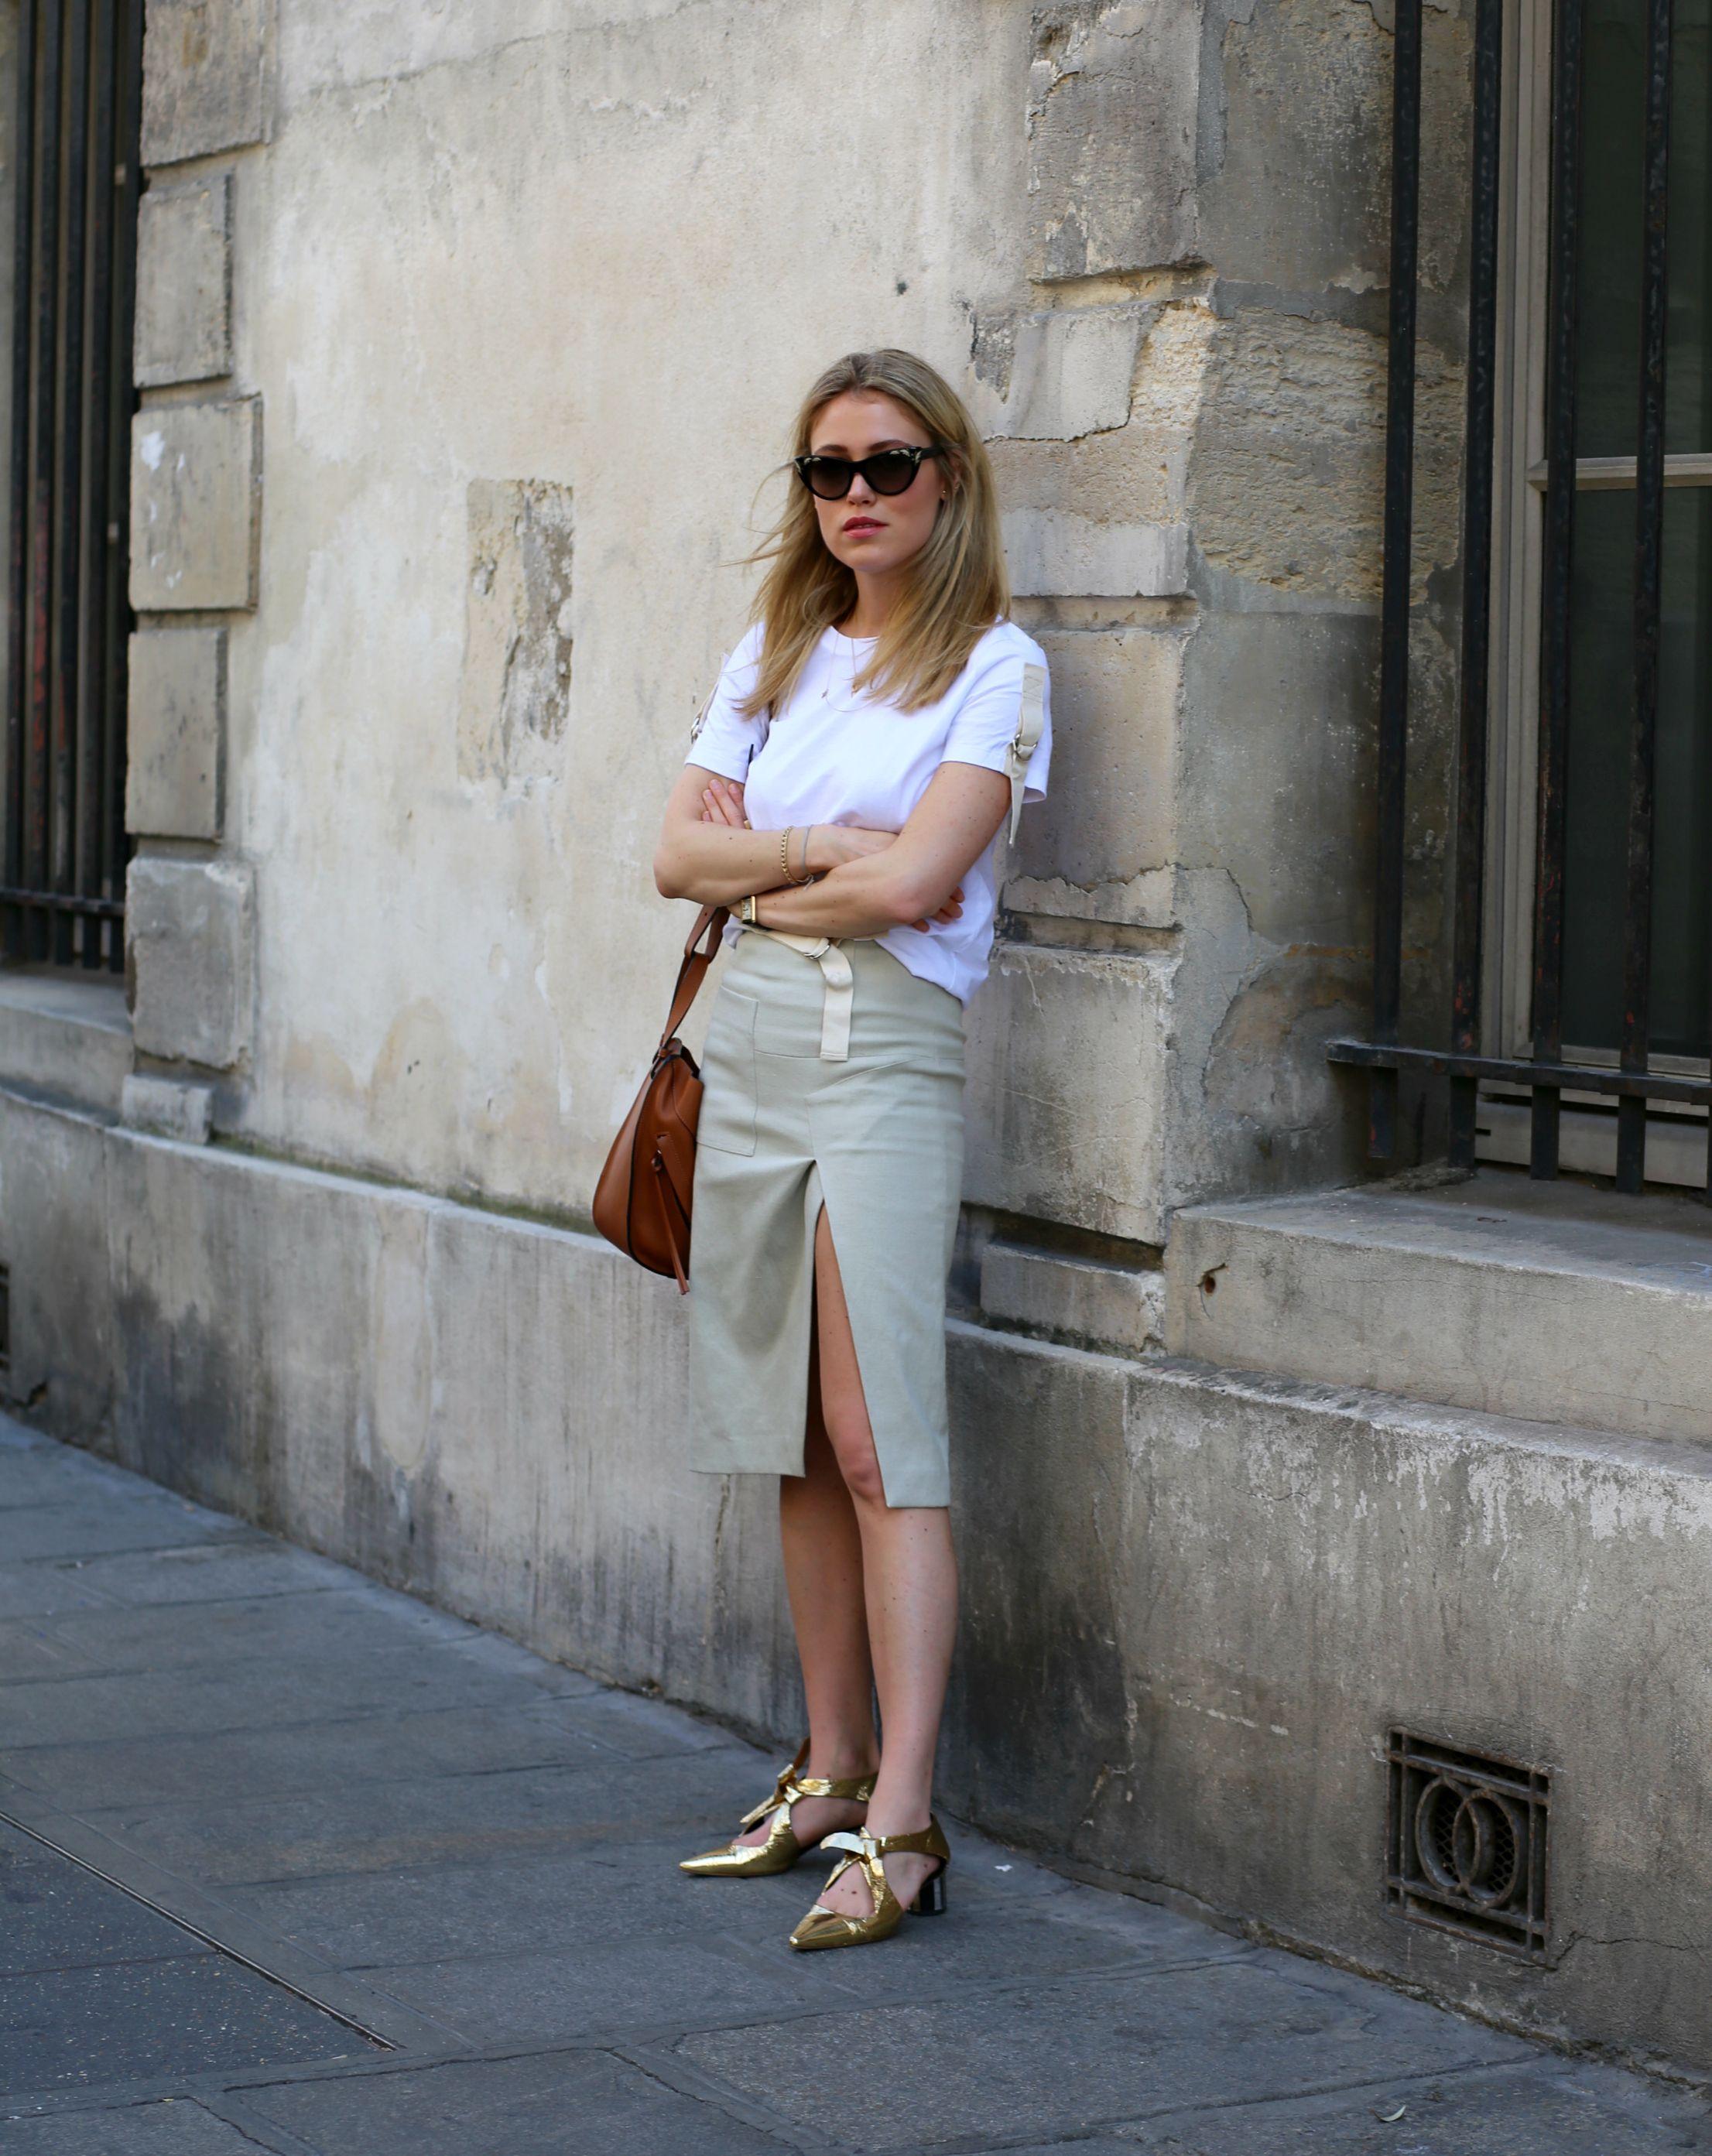 Streets of Paris | Annabel